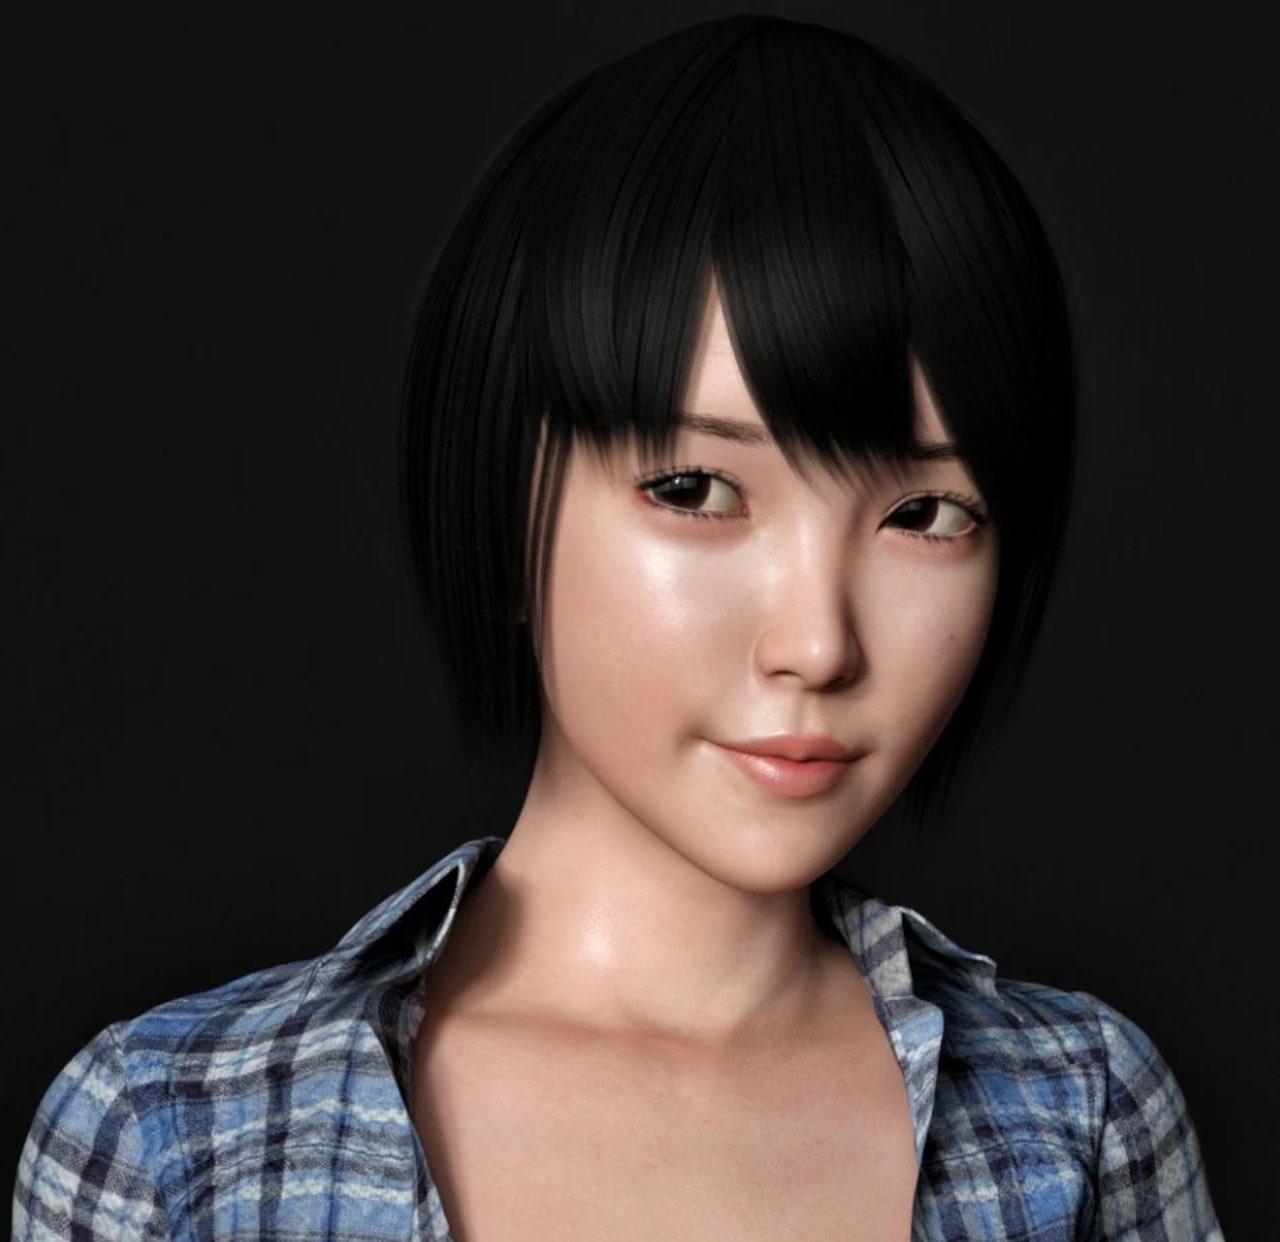 daz studio yuna character and hair